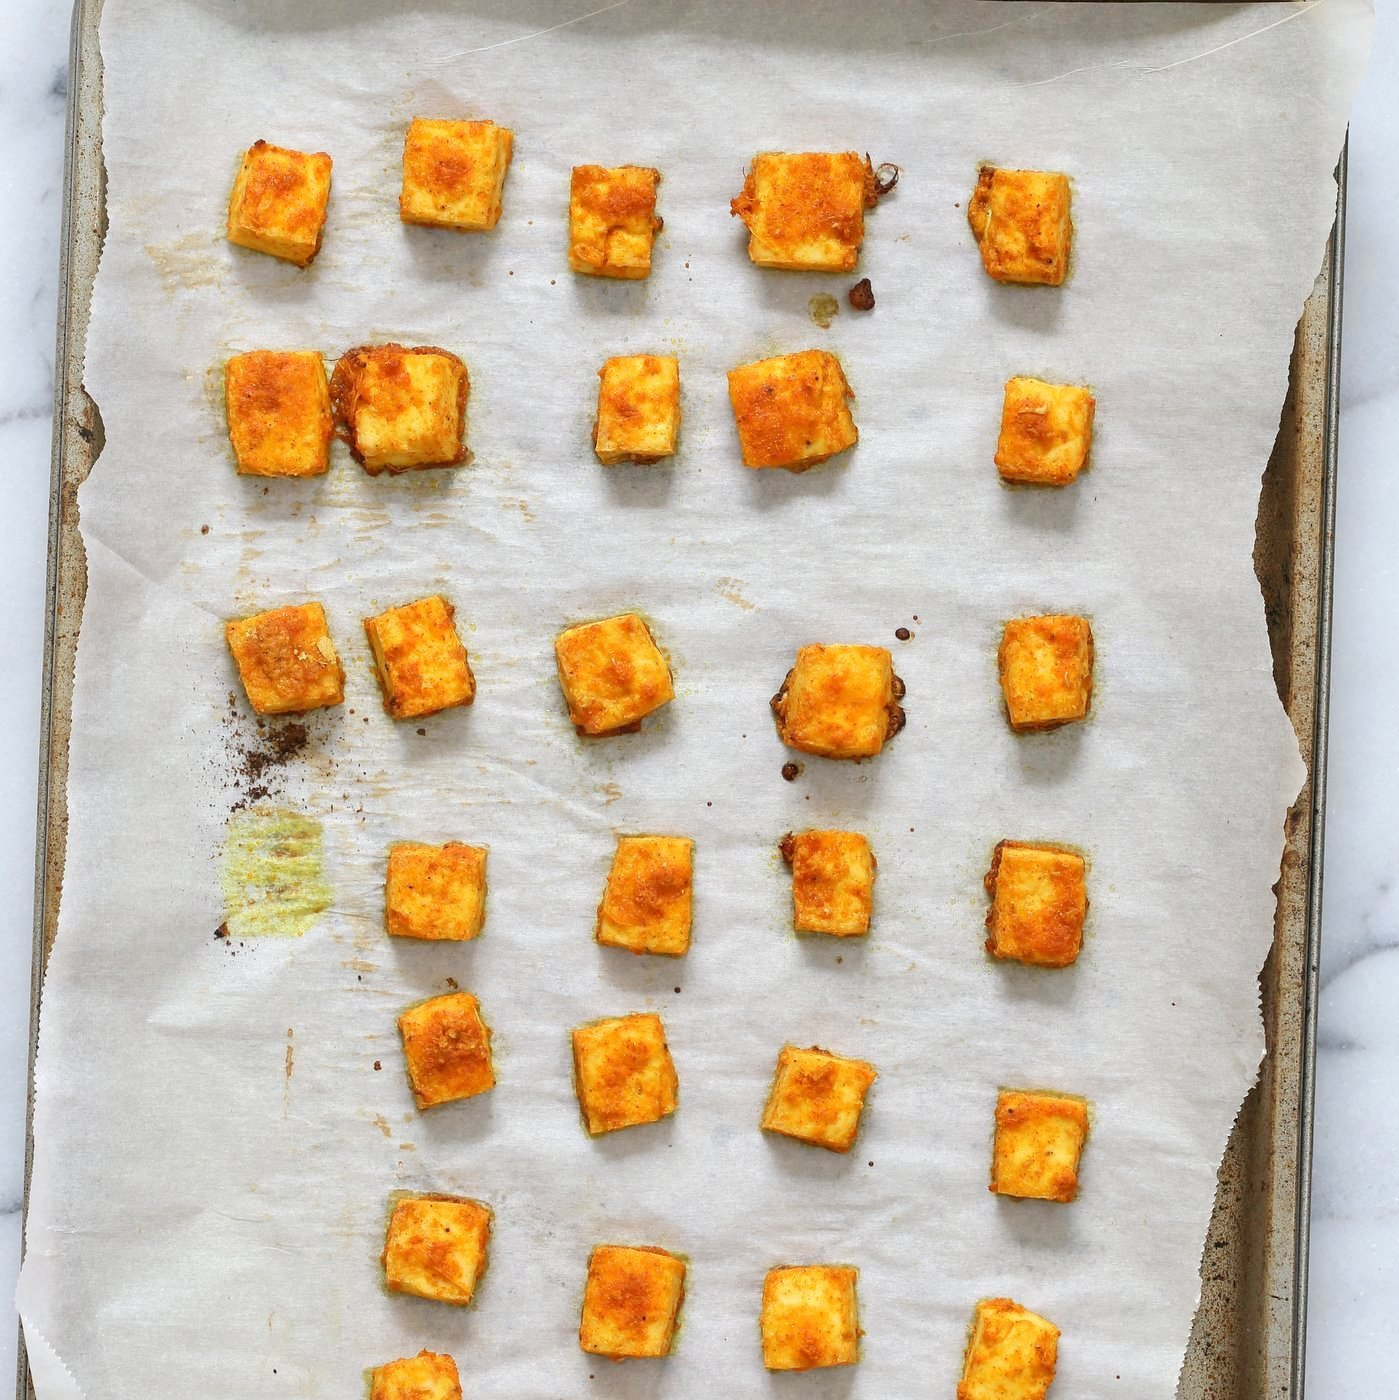 "Restaurant Style Tofu Butter Masala Recipe - Indian Butter Tofu ""Paneer"". Dairy-free Tofu Paneer Butter Masala. Tofu is marinated and baked then simmered in tomato ginger cashew sauce. Vegan Gluten-free Recipe. | VeganRicha.com"